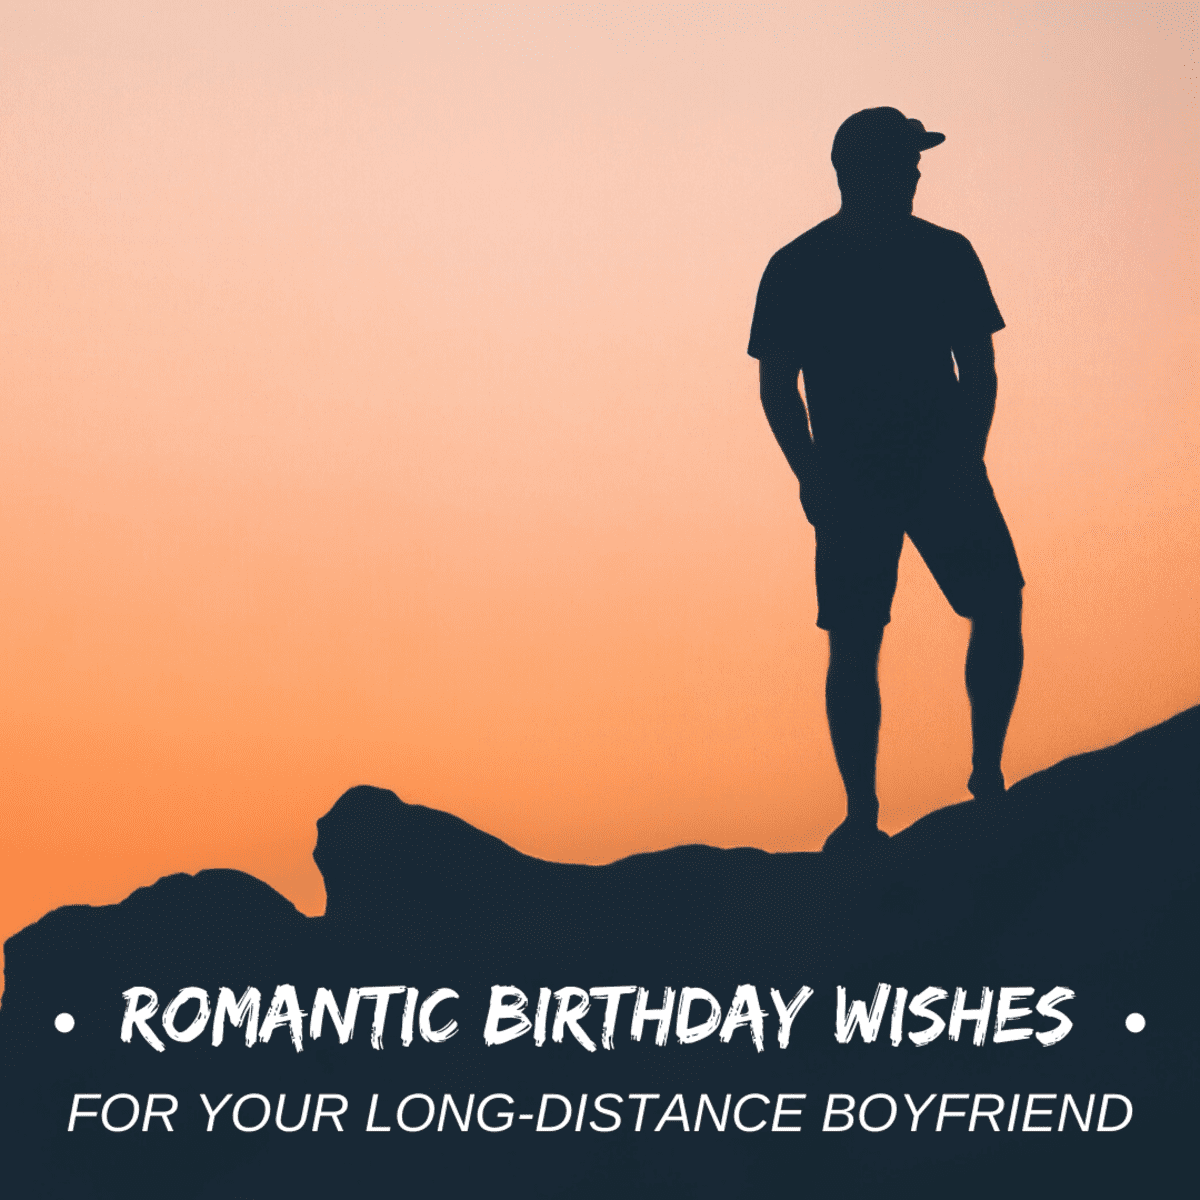 Male crush wishes birthday for Romantic Birthday